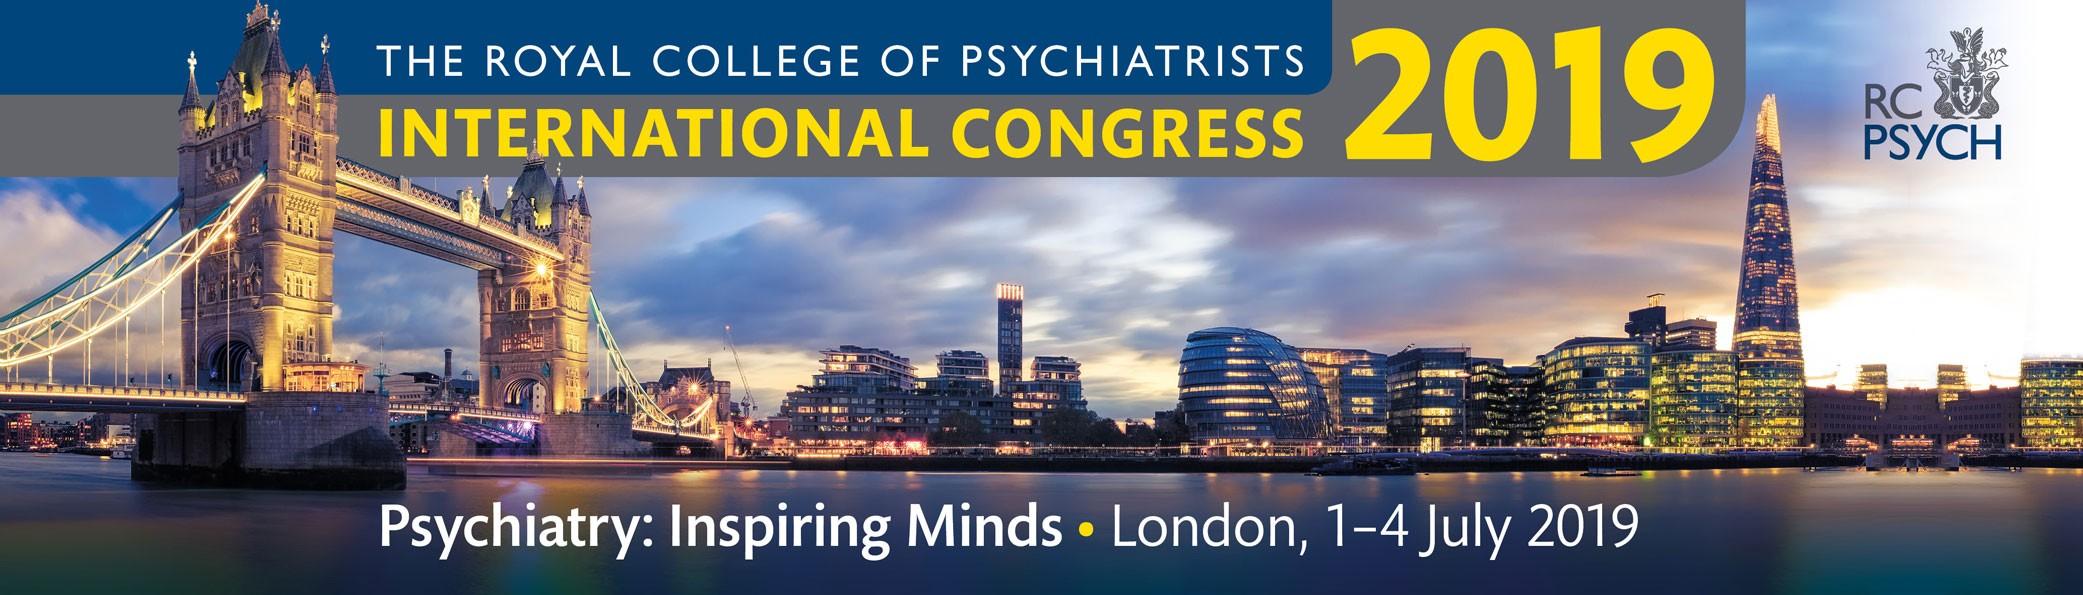 The Royal College of Psychiatrists | LinkedIn